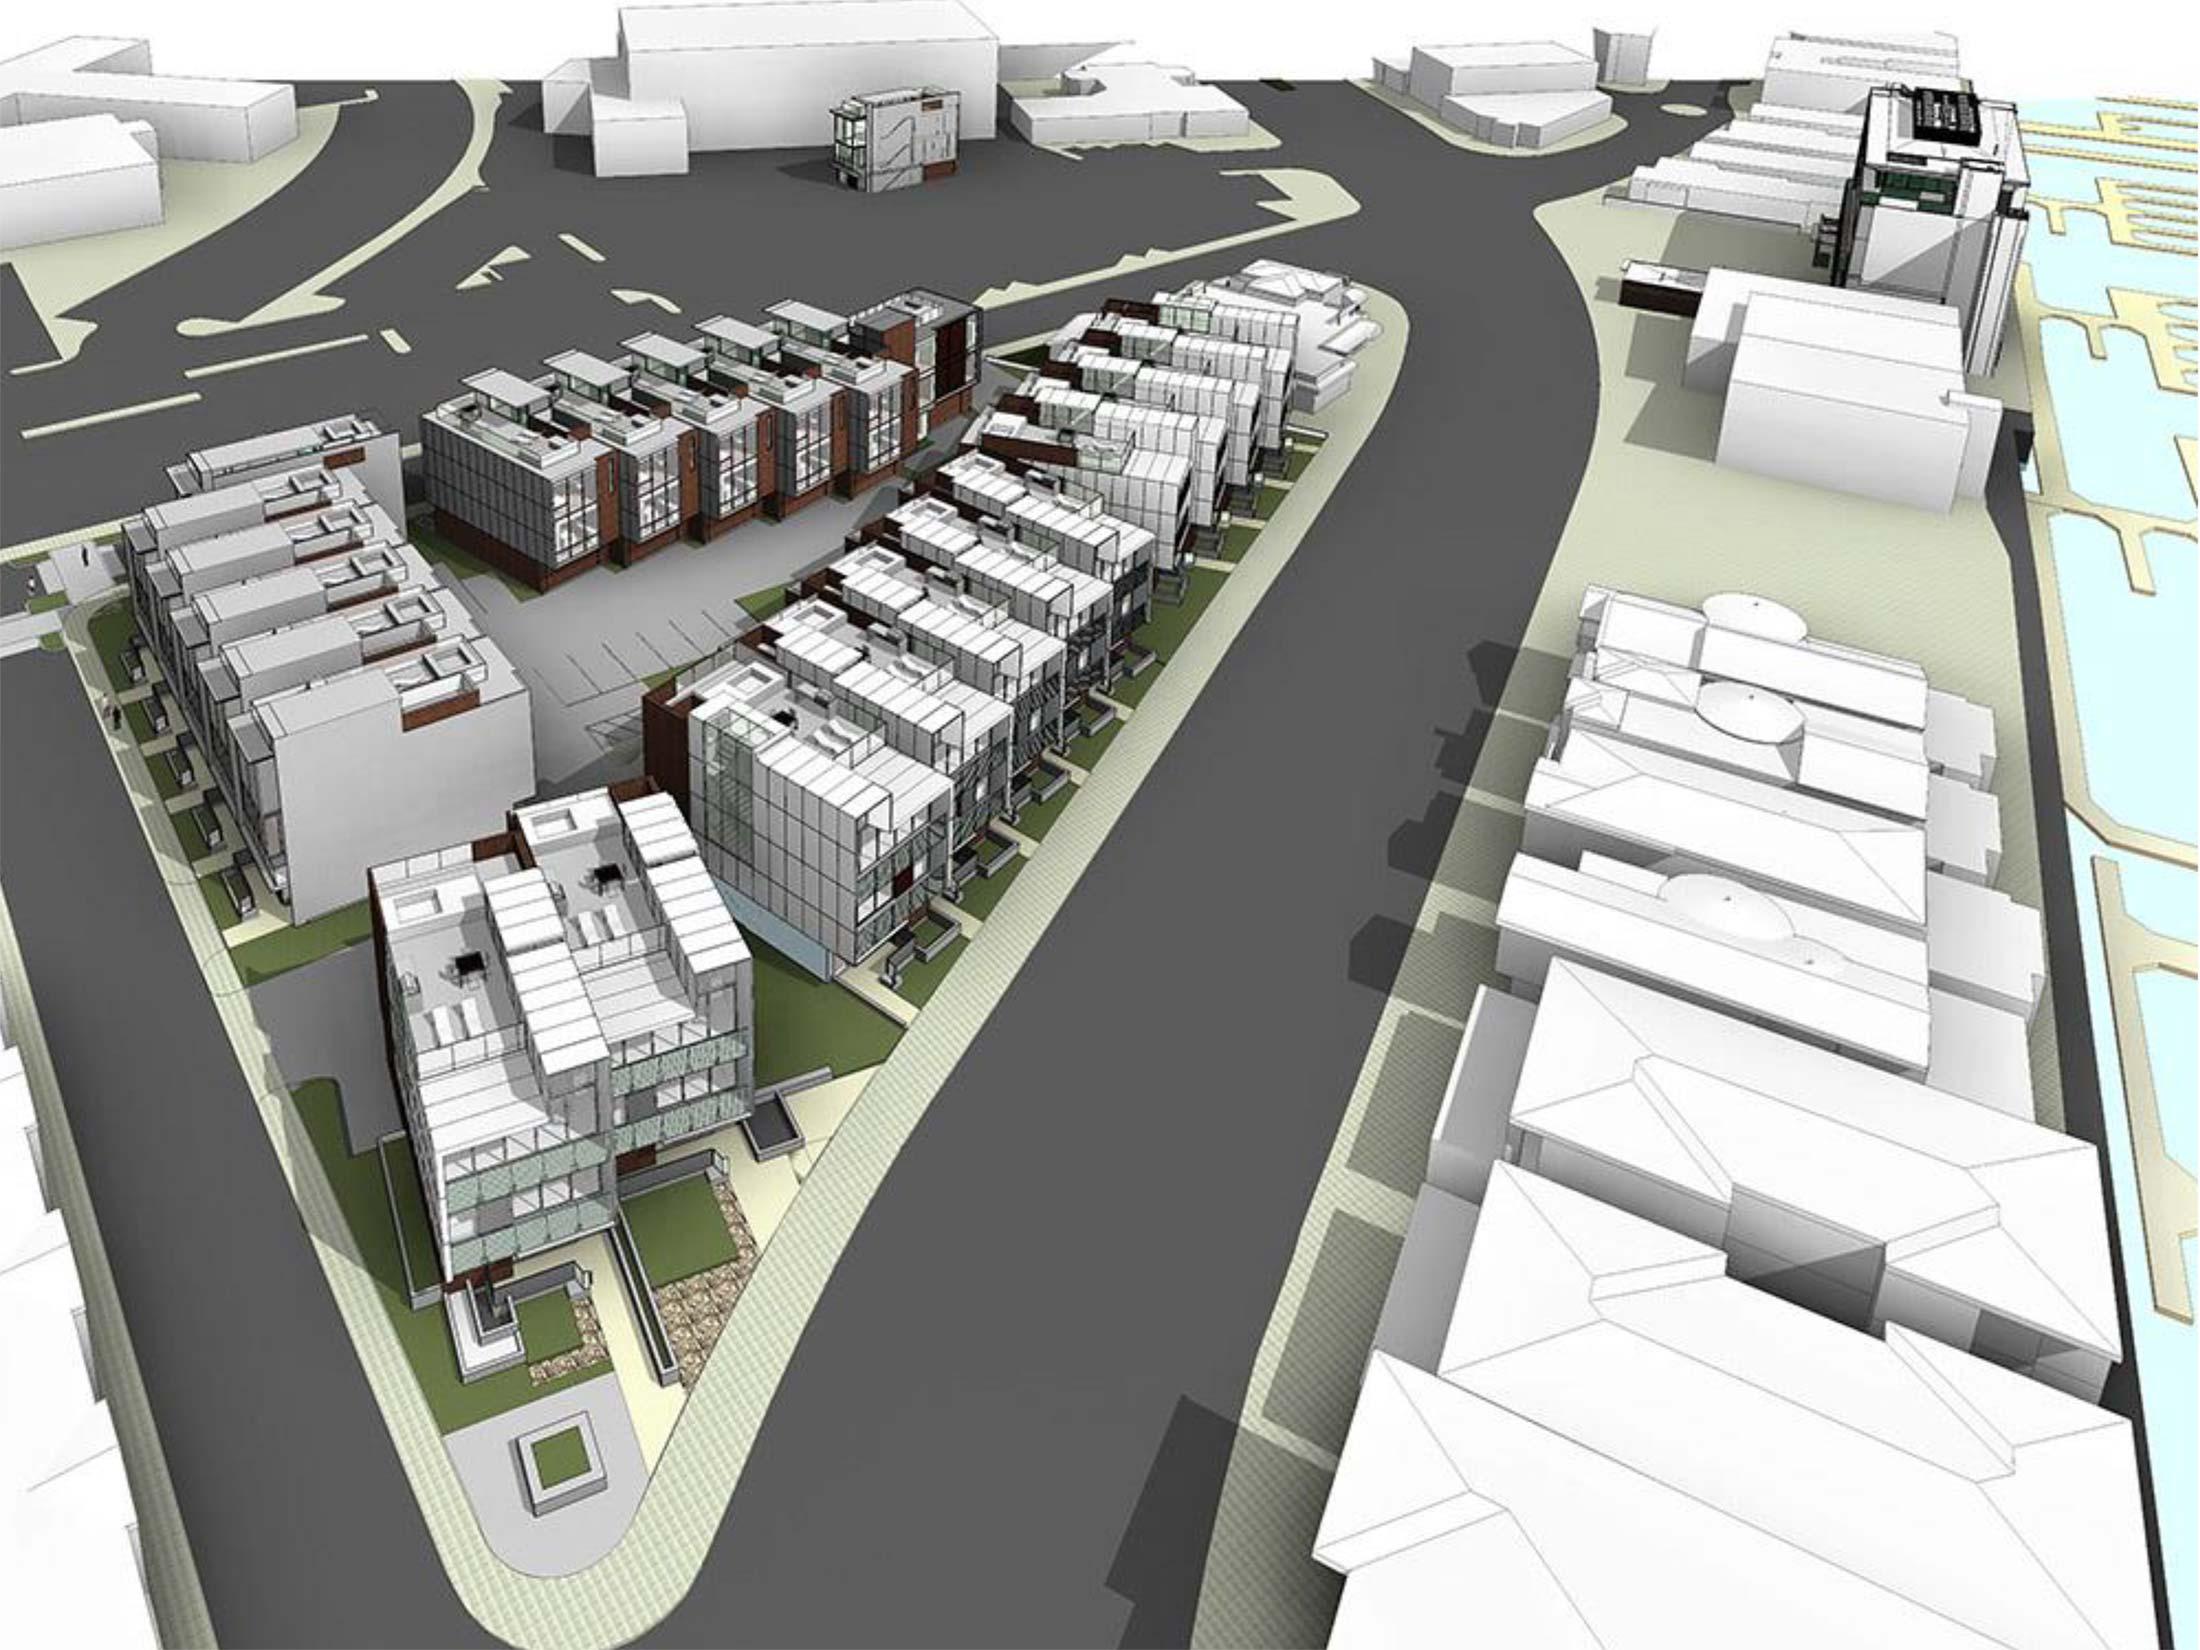 modern-architecture-building-residential-shubindonaldson-via-lido-townhouse-4